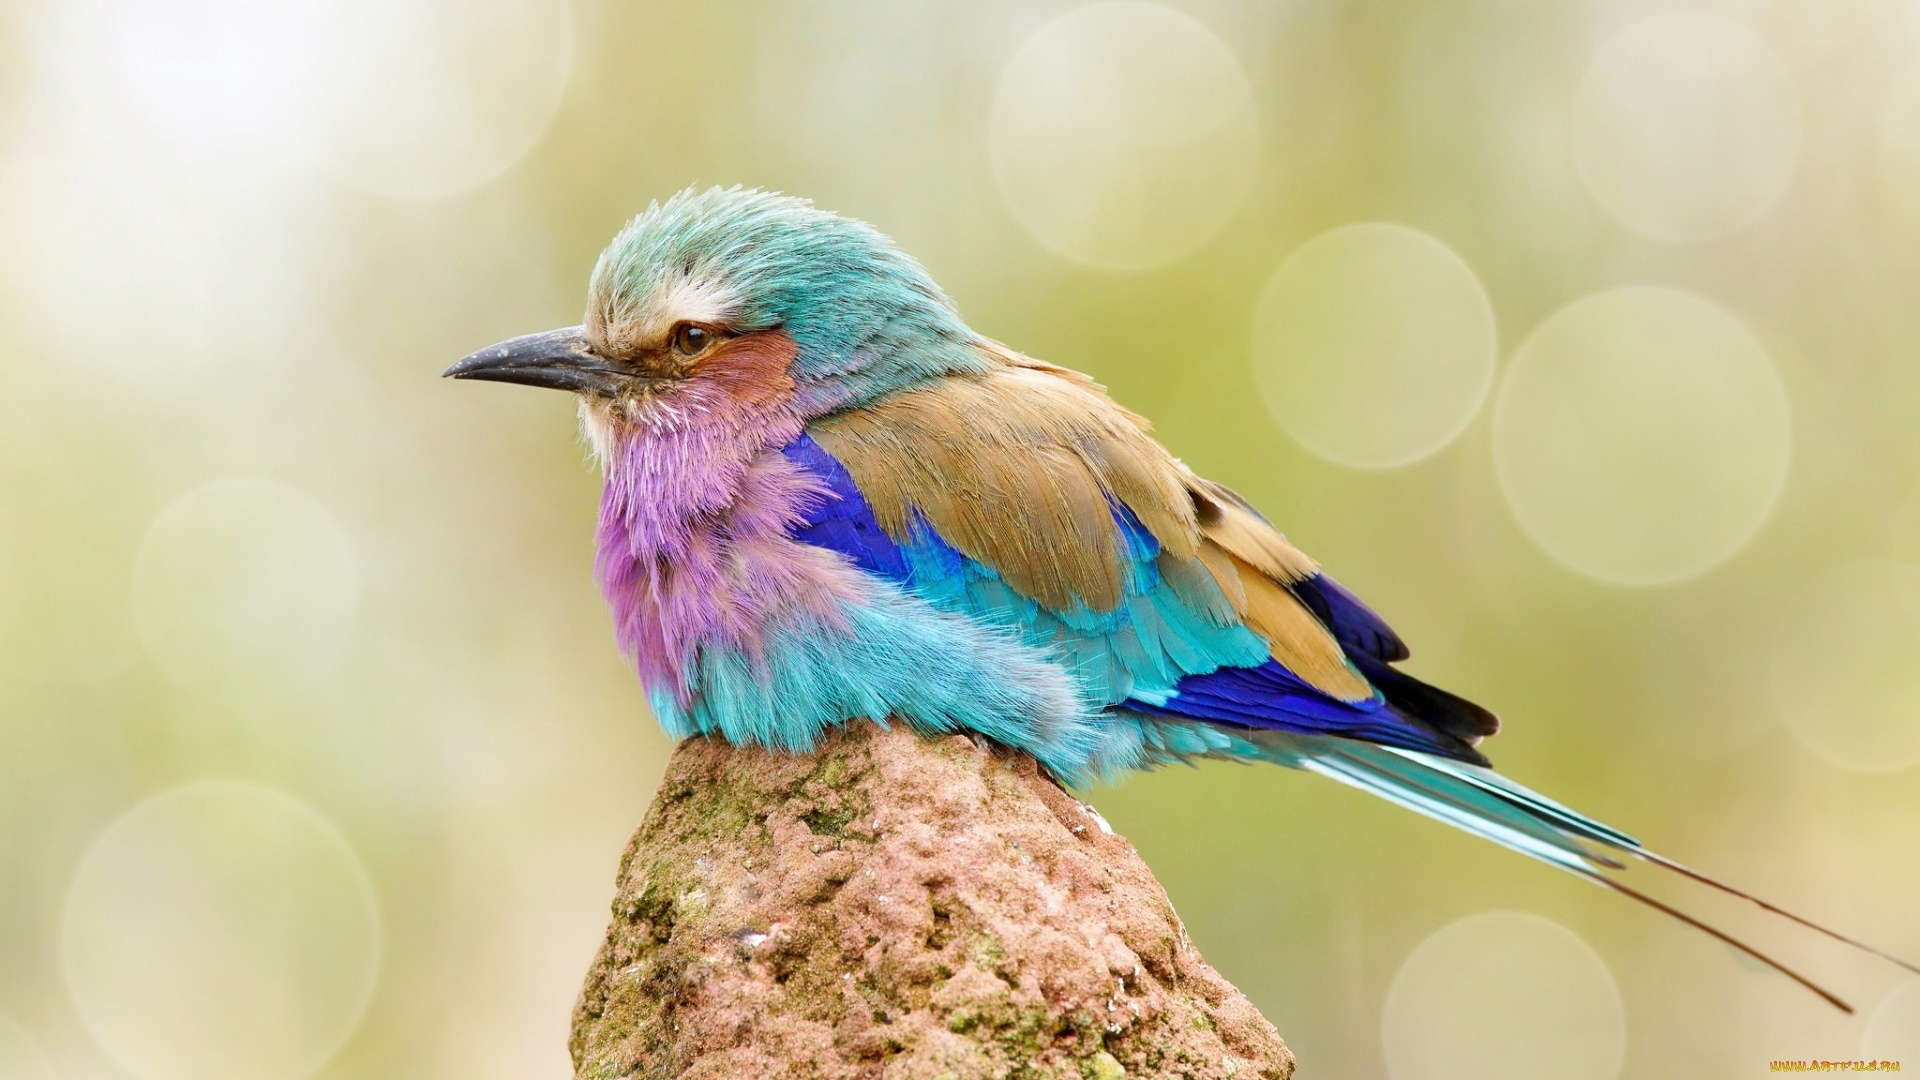 Colorful Bird free photo